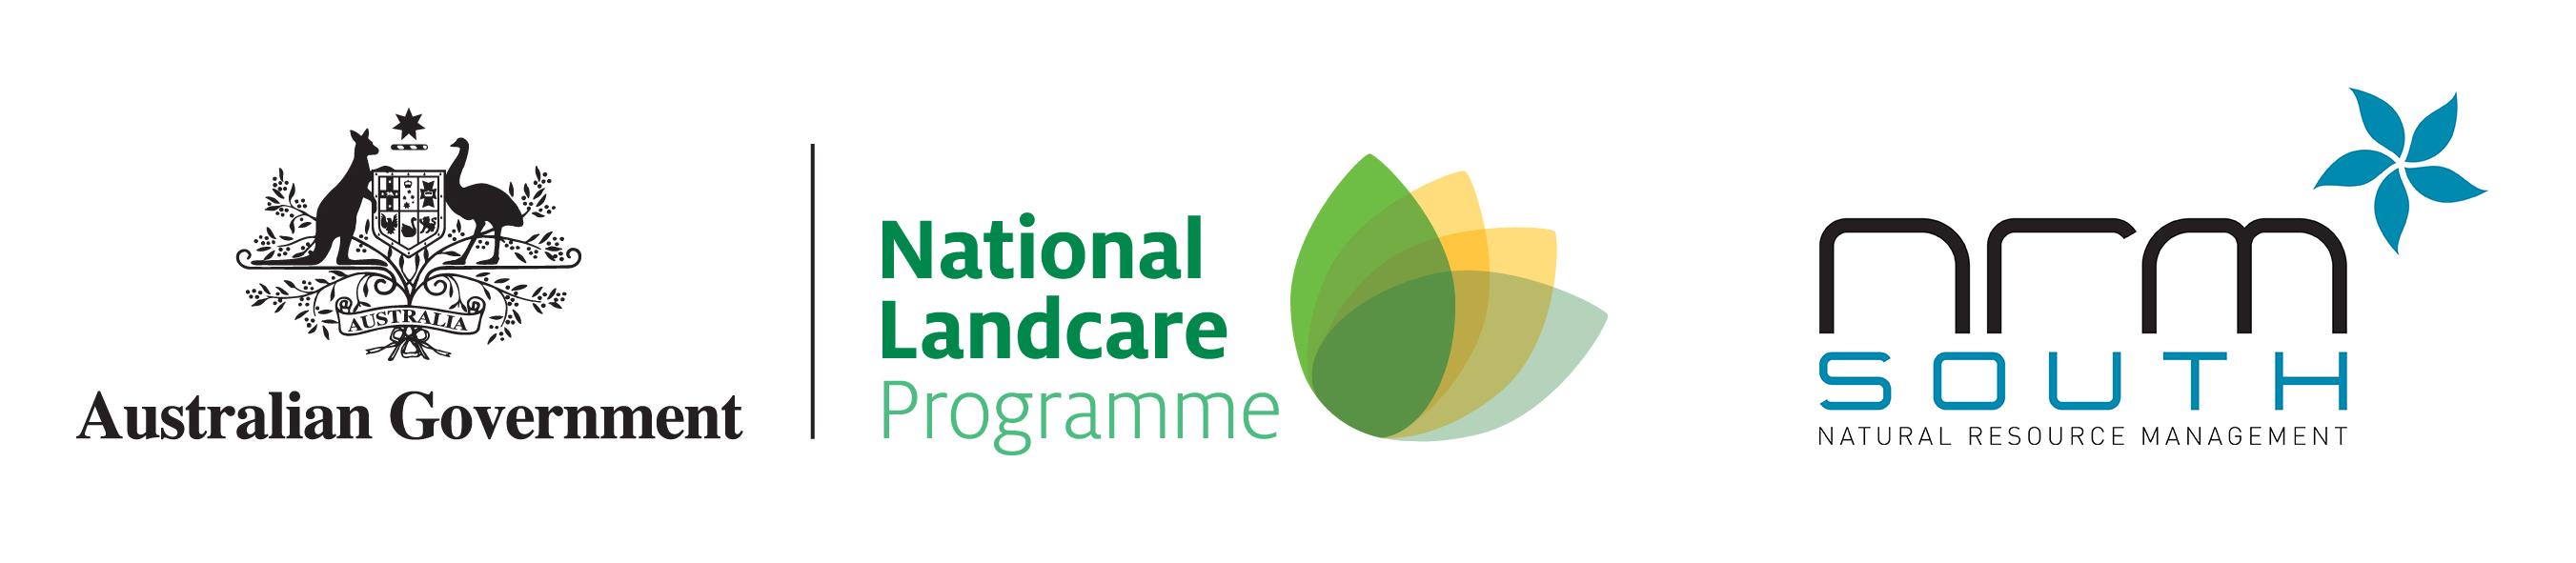 NLP_-NRM_South_logo.jpg